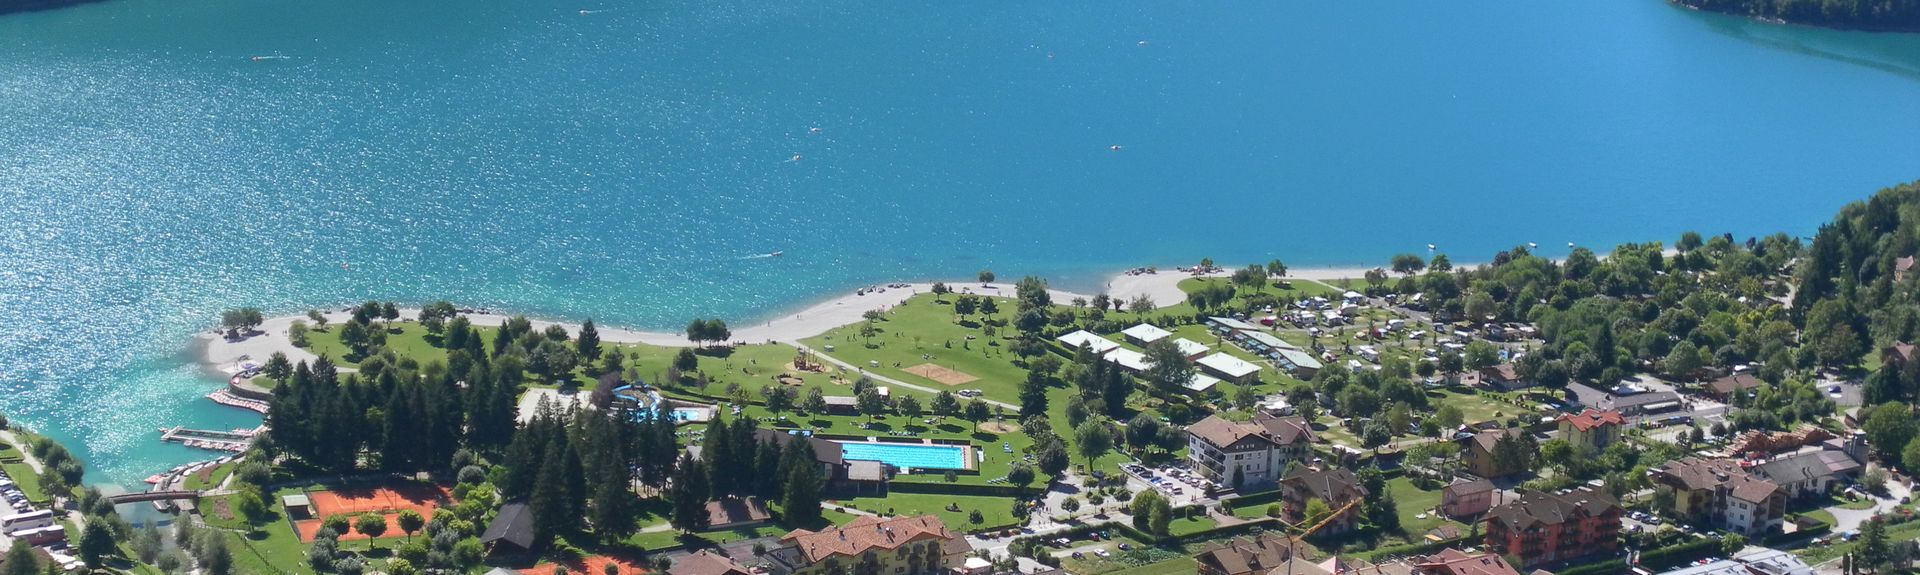 Trentos universitet, Trento, Trentino-Alto Adige, Italien